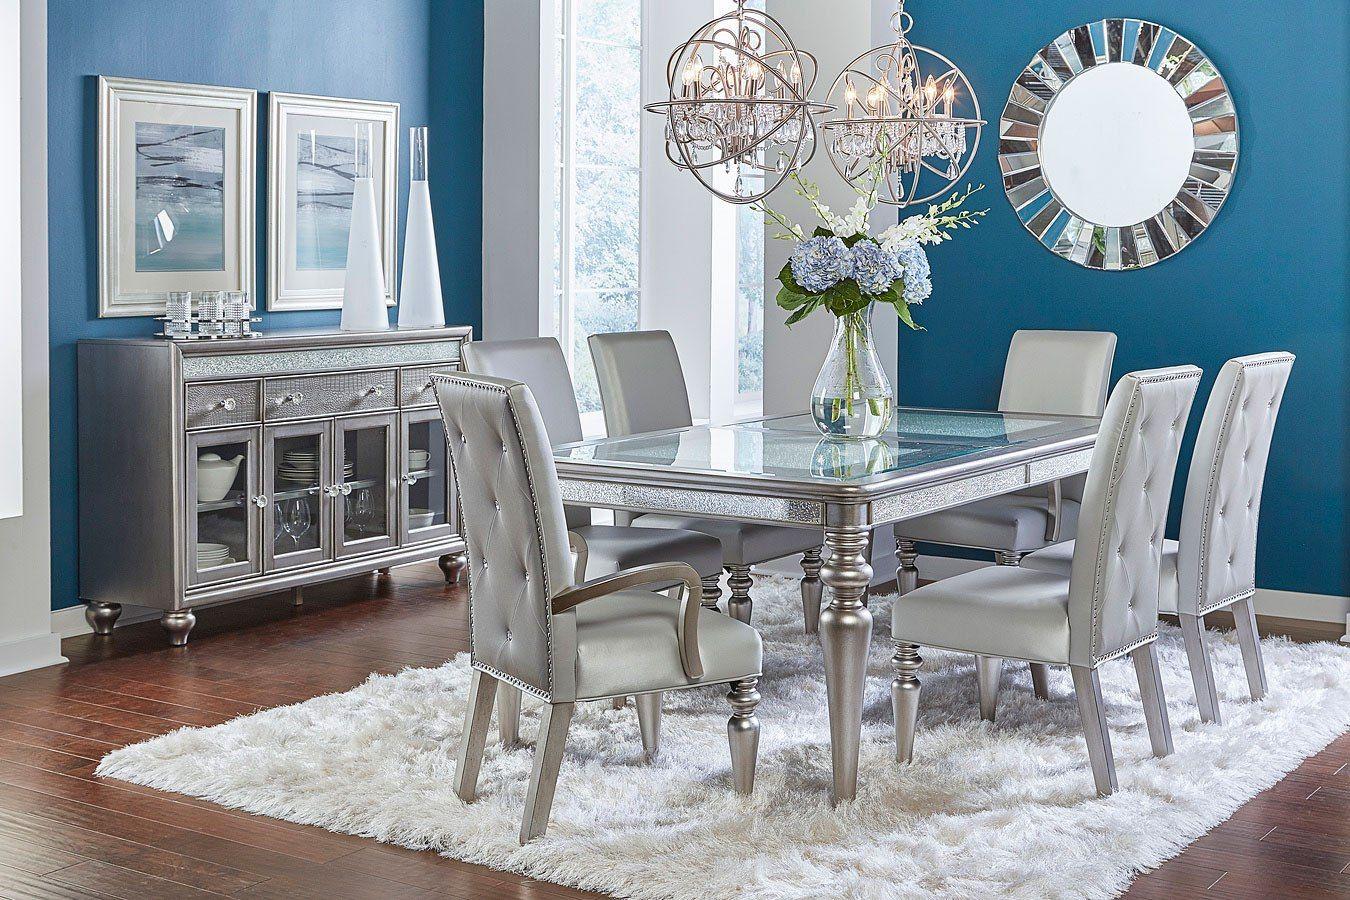 Posh Dining Room Set Luxury Dining Room Dining Room Interiors